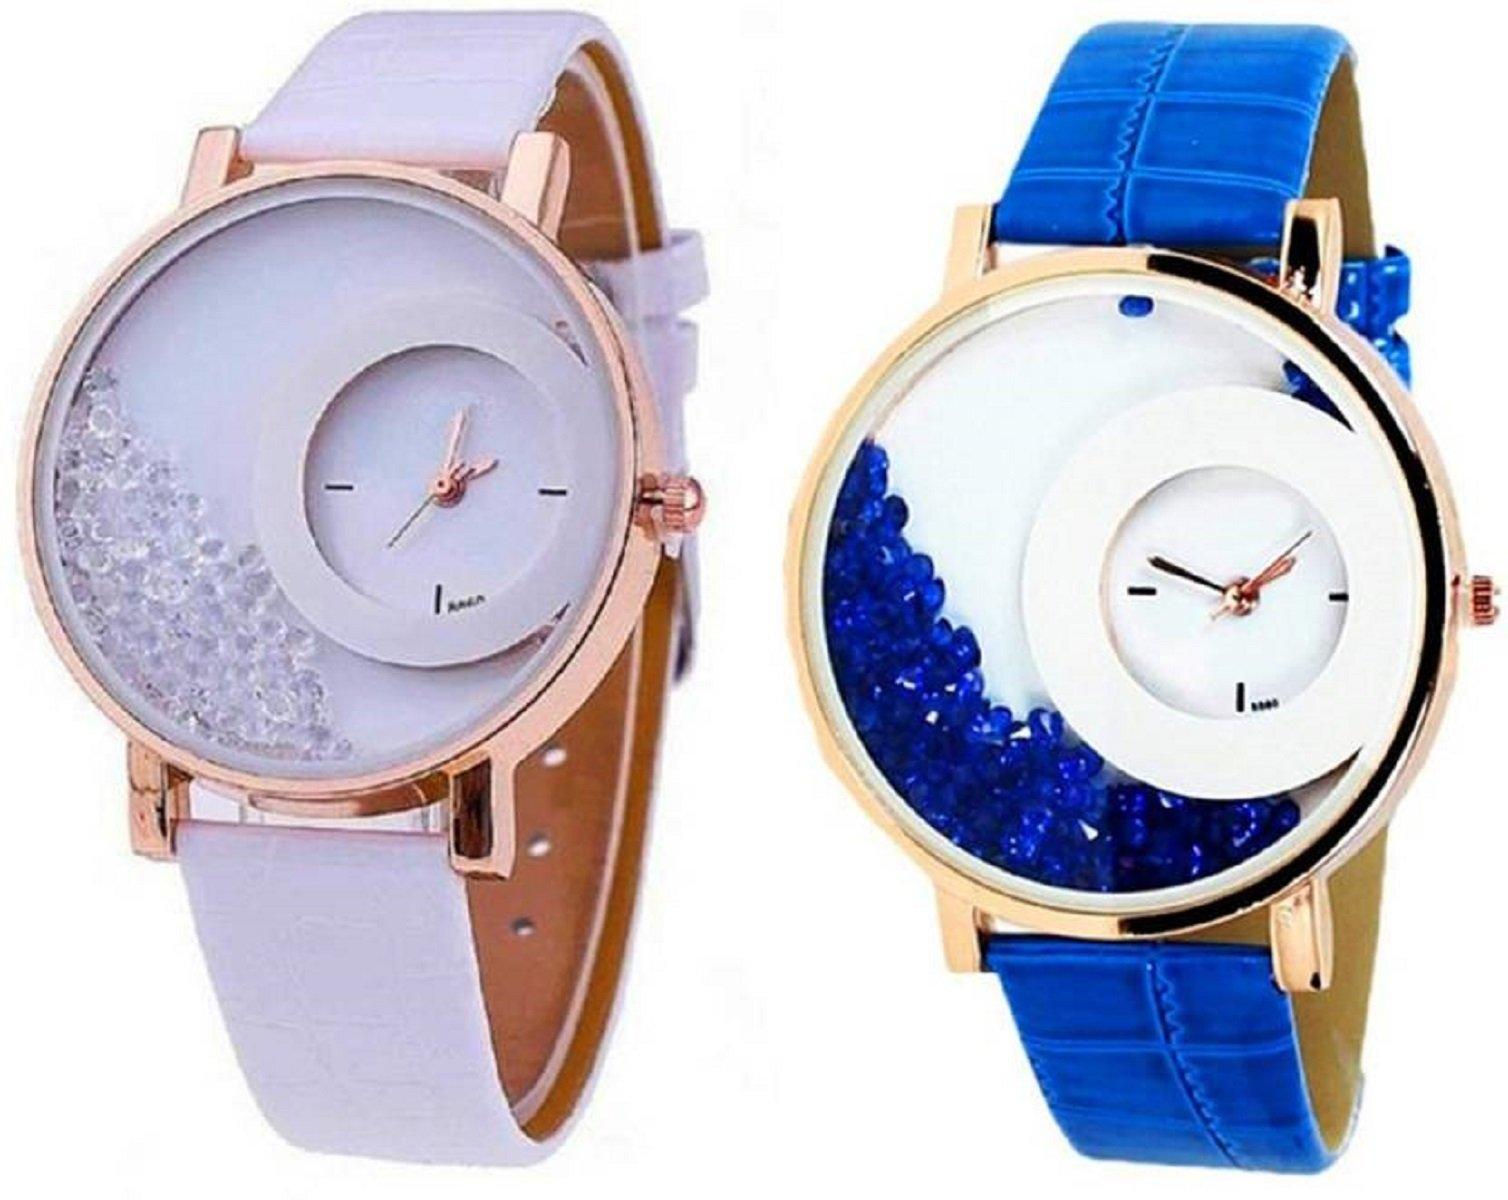 Freny Exim Quartz Analogue White and Blue Diamonds Multicolour Dial Leather Women's Watch (B079SXRY4P) Amazon Price History, Amazon Price Tracker